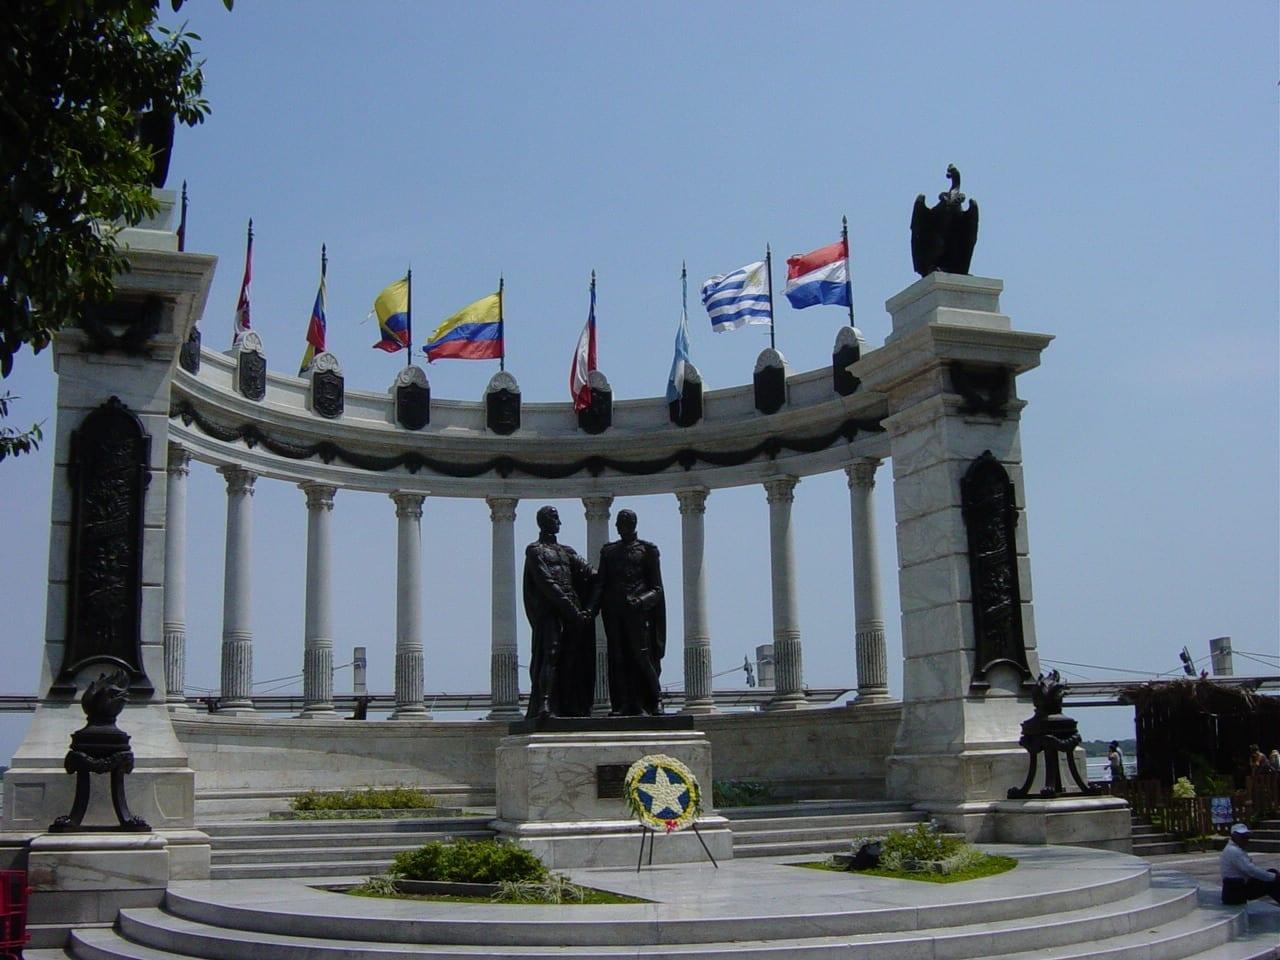 El monumento de la rotonda Guayaquil Ecuador